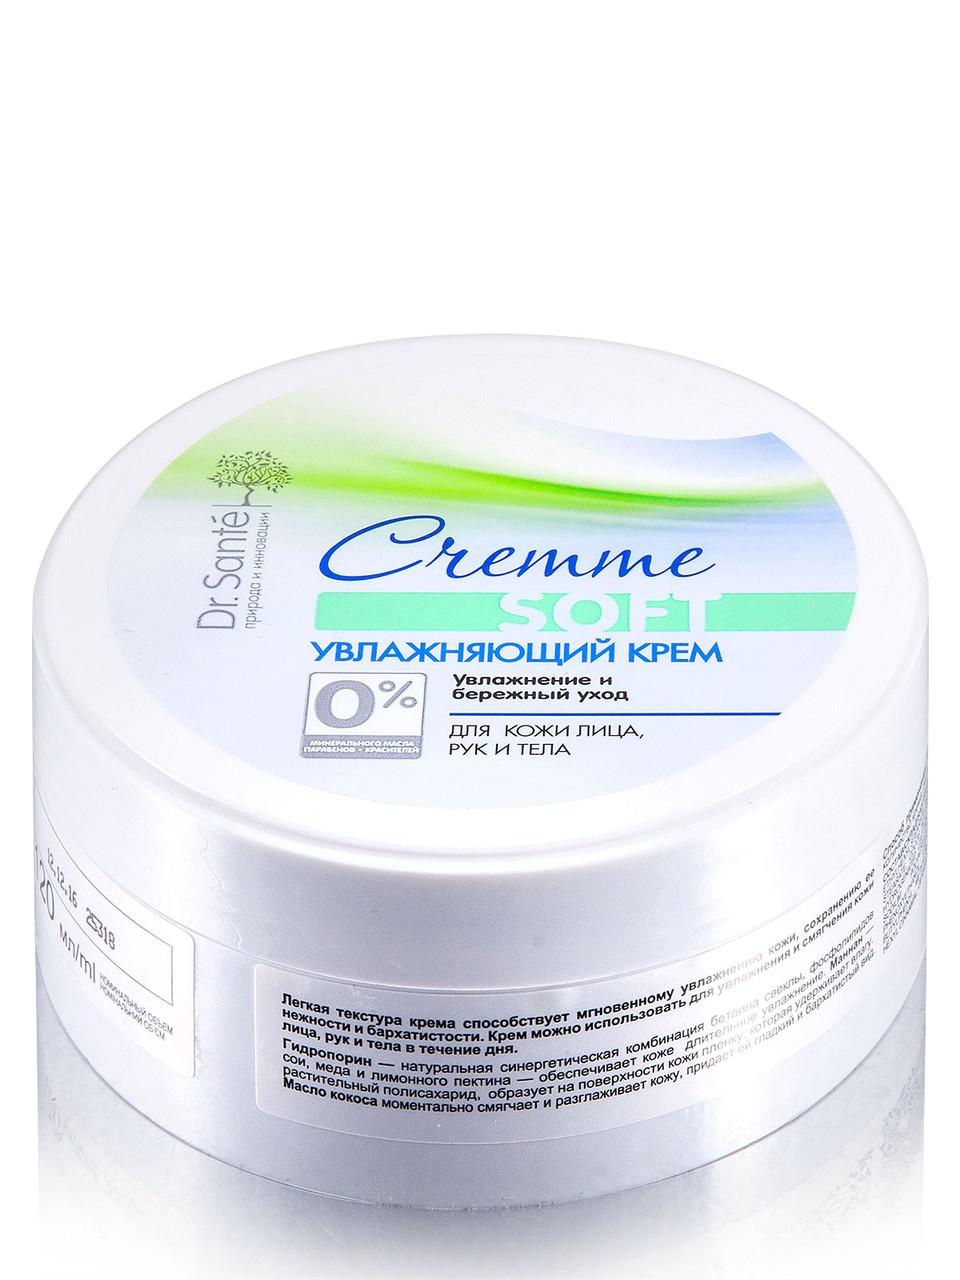 "Cremme Soft ""Увлажняющий крем"" Dr.Sante, 120мл"